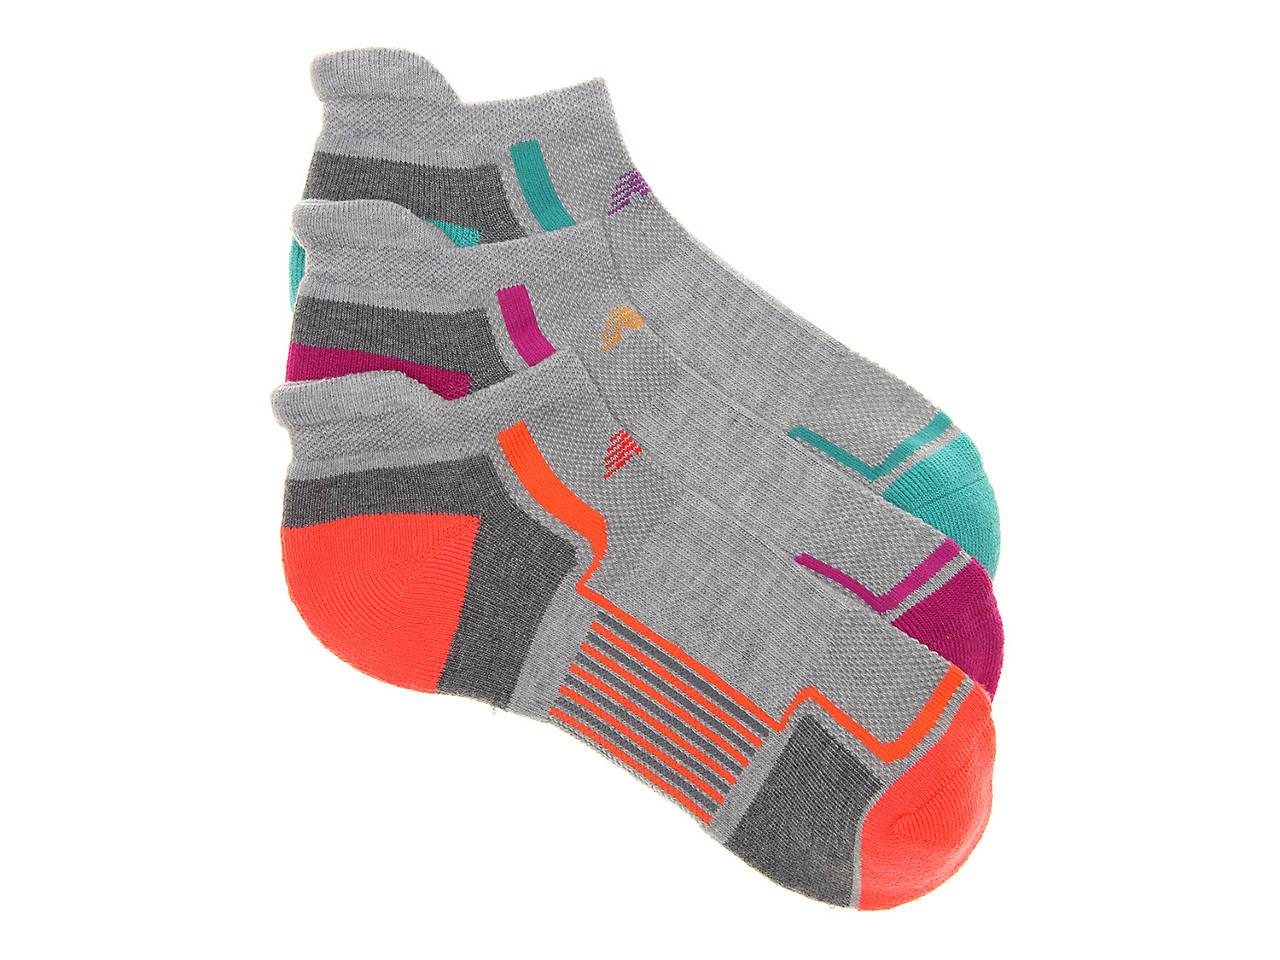 b2fc8cc6 Tab Performance Women's No Show Socks - 3 Pack